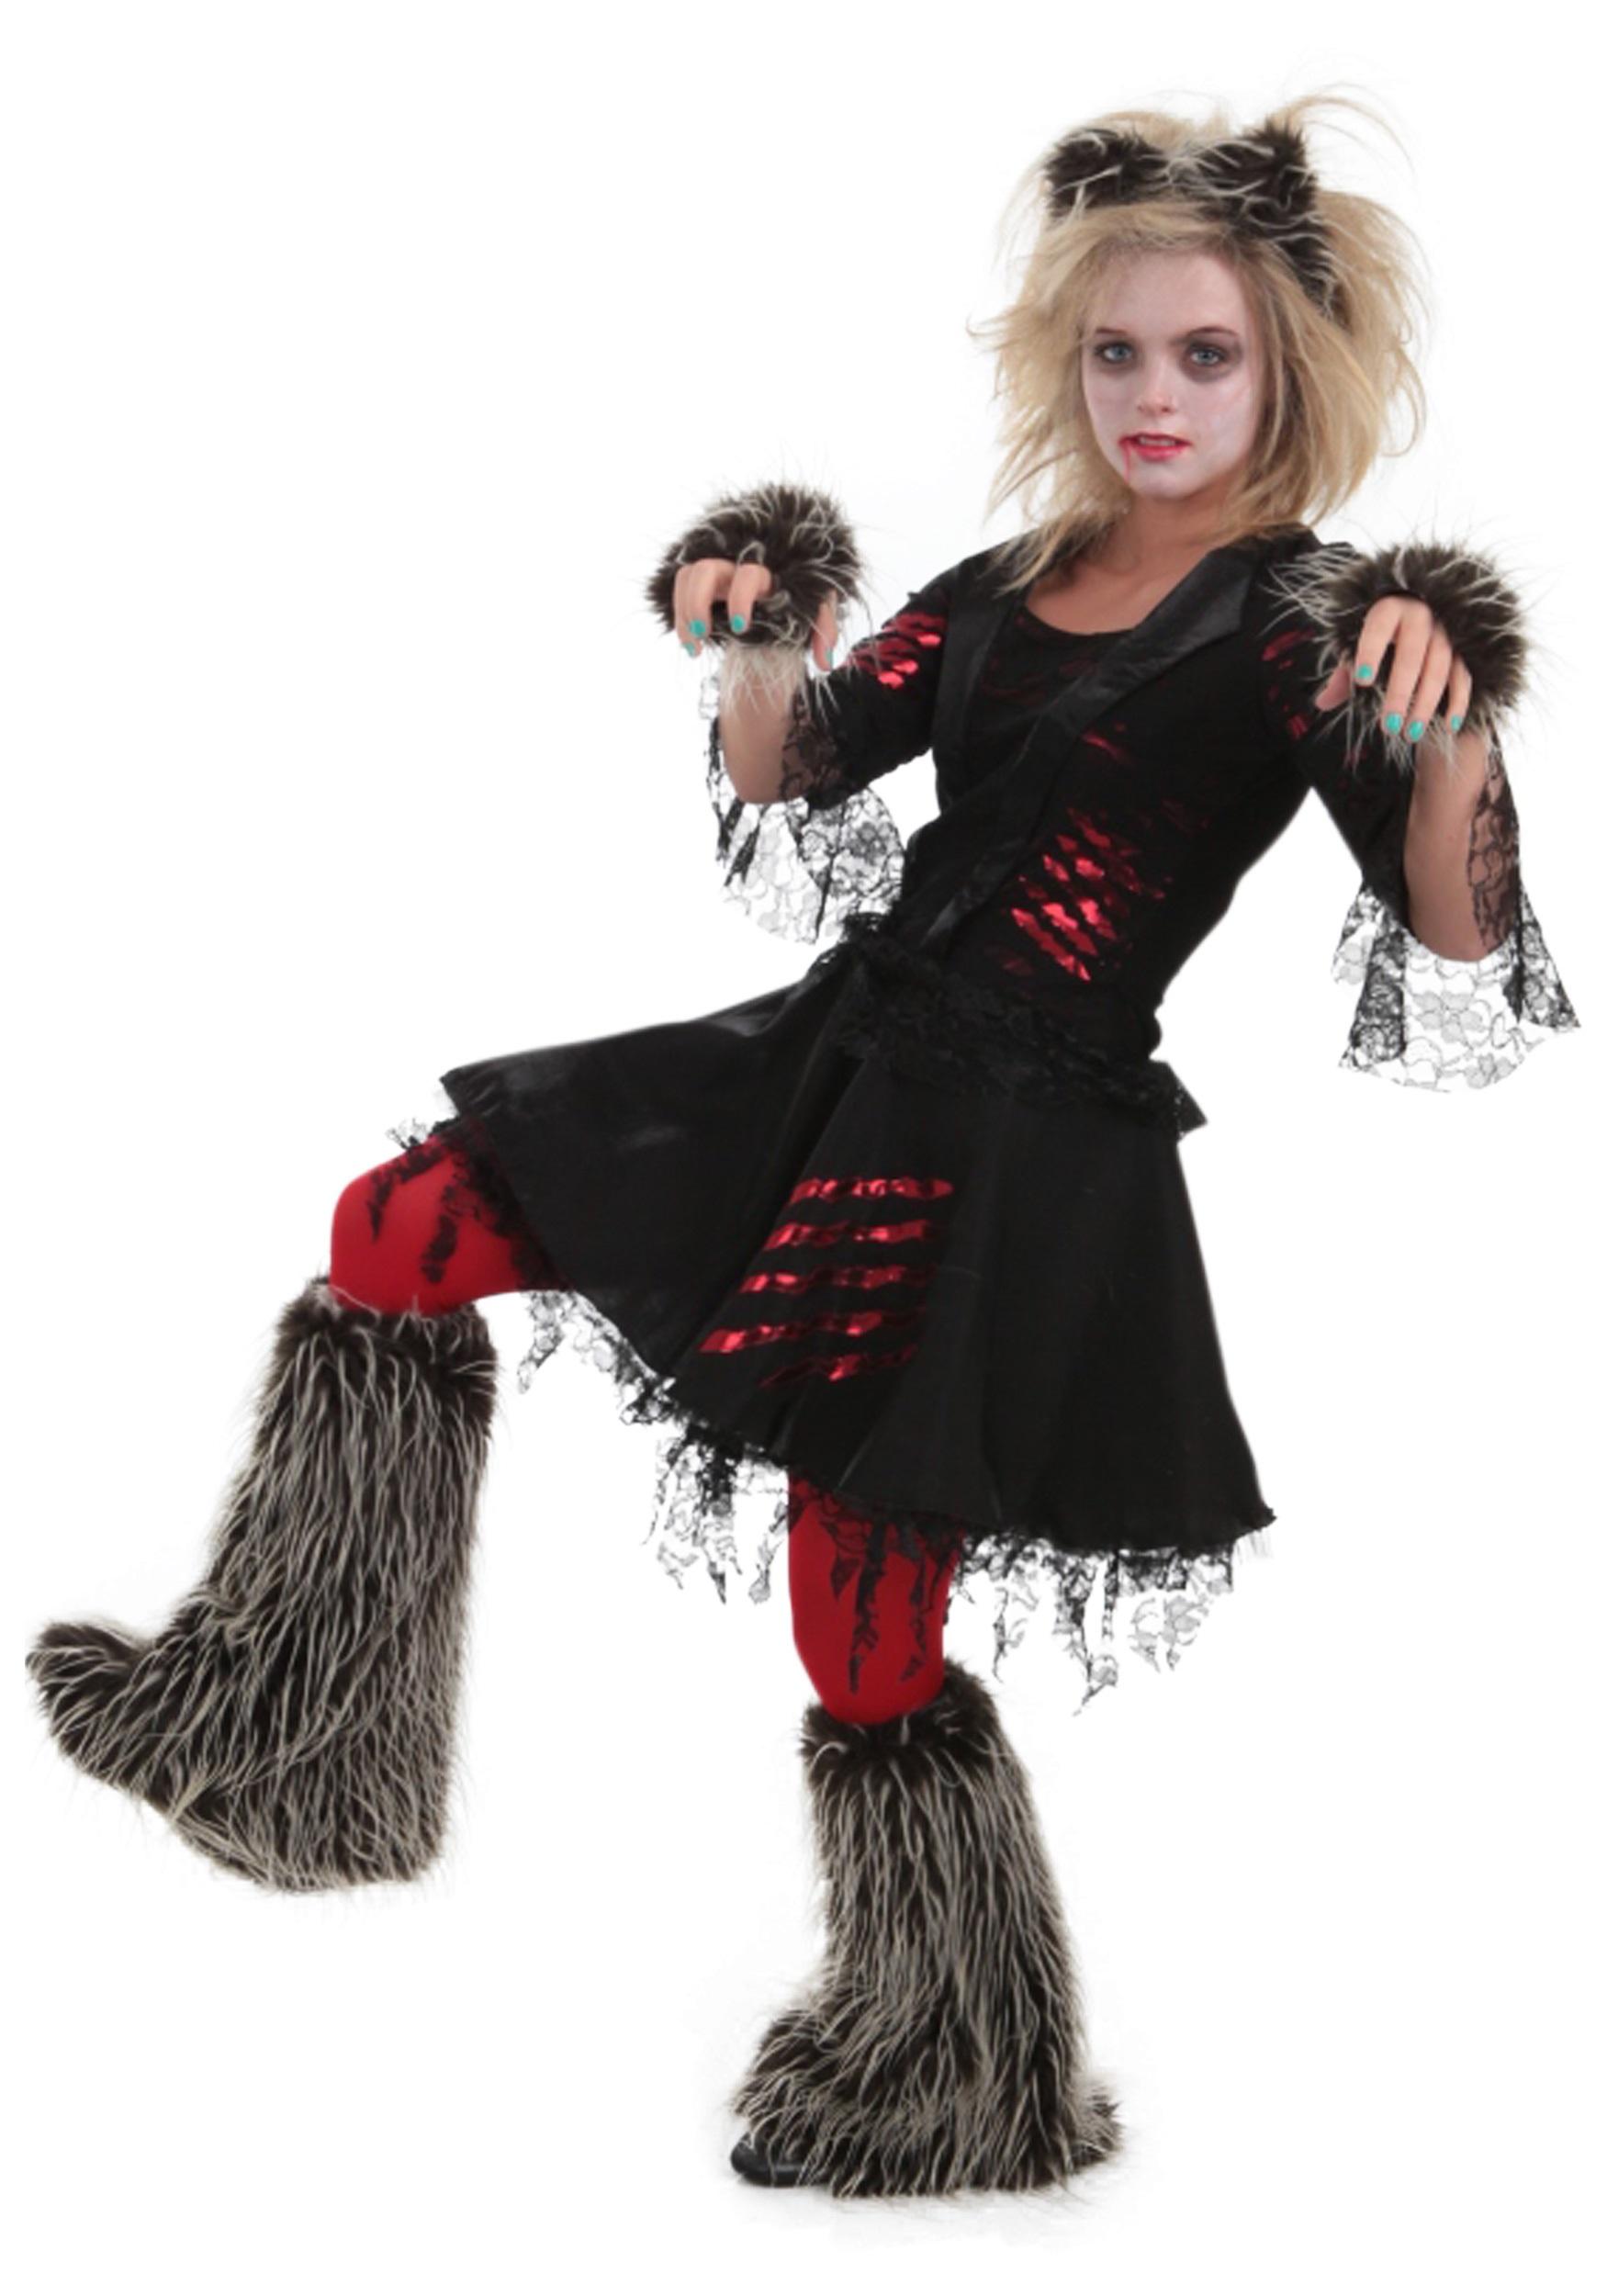 Werewolf Costume Halloween Wiki Fandom Powered By Wikia